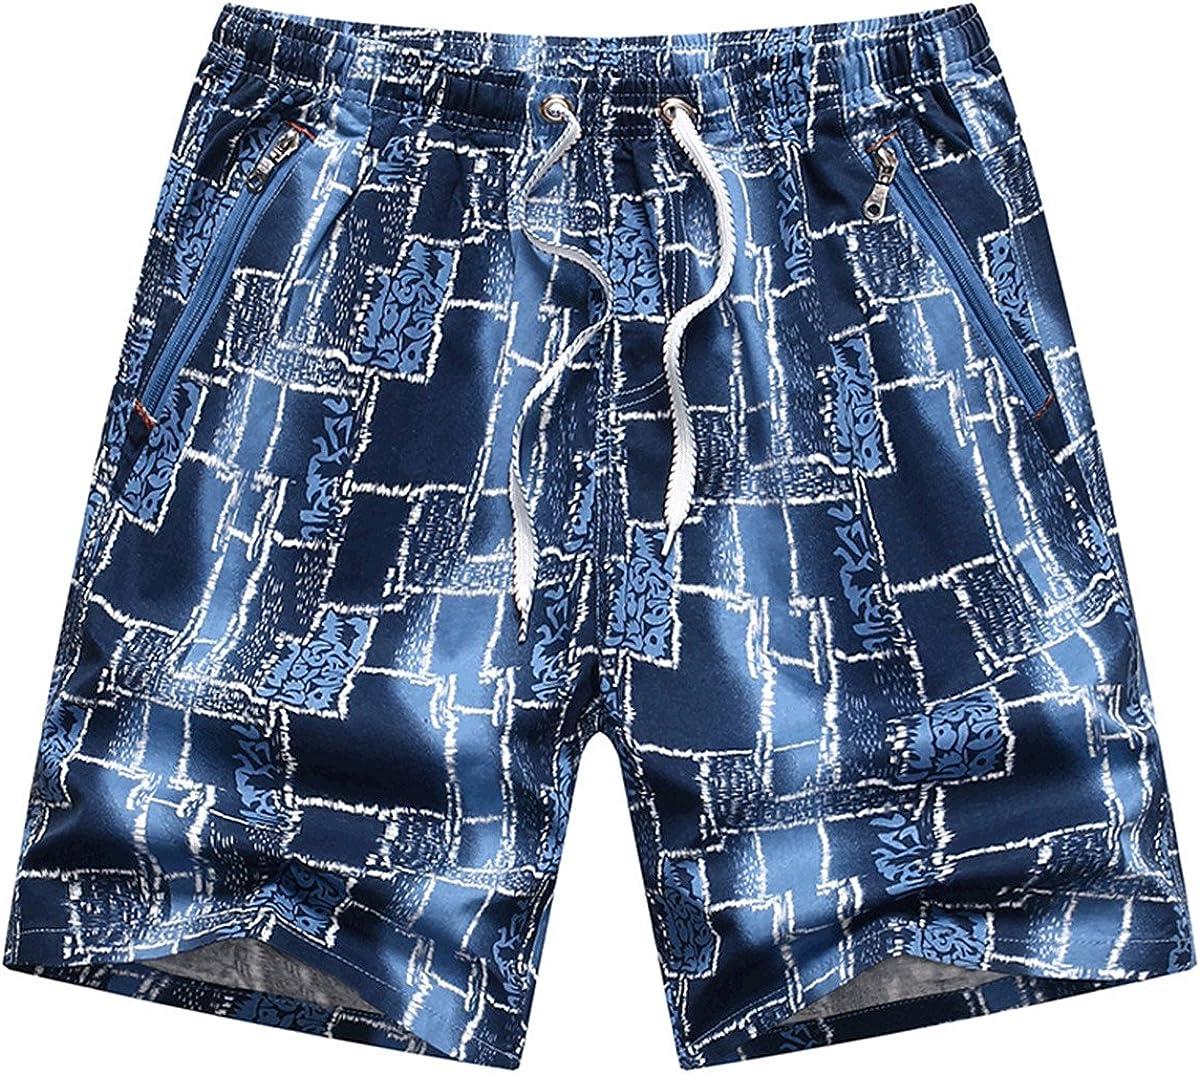 Hanxue Mens Beach Shorts With Pockets Quick Dry Summer Boardshort Shorts